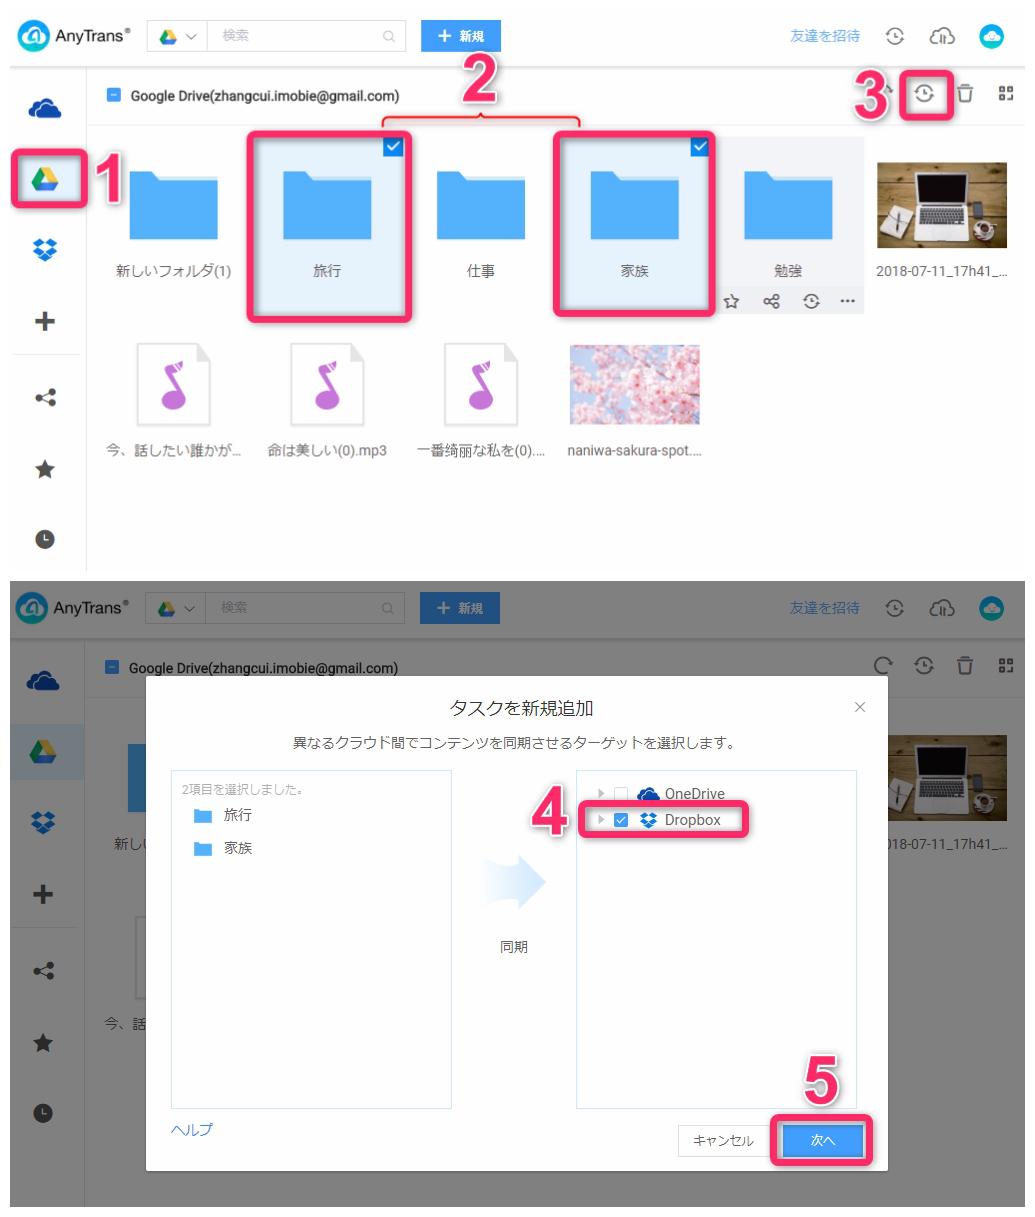 Google DriveフォルダをDropbox/Box/One Drive等のクラウドに移行する方法